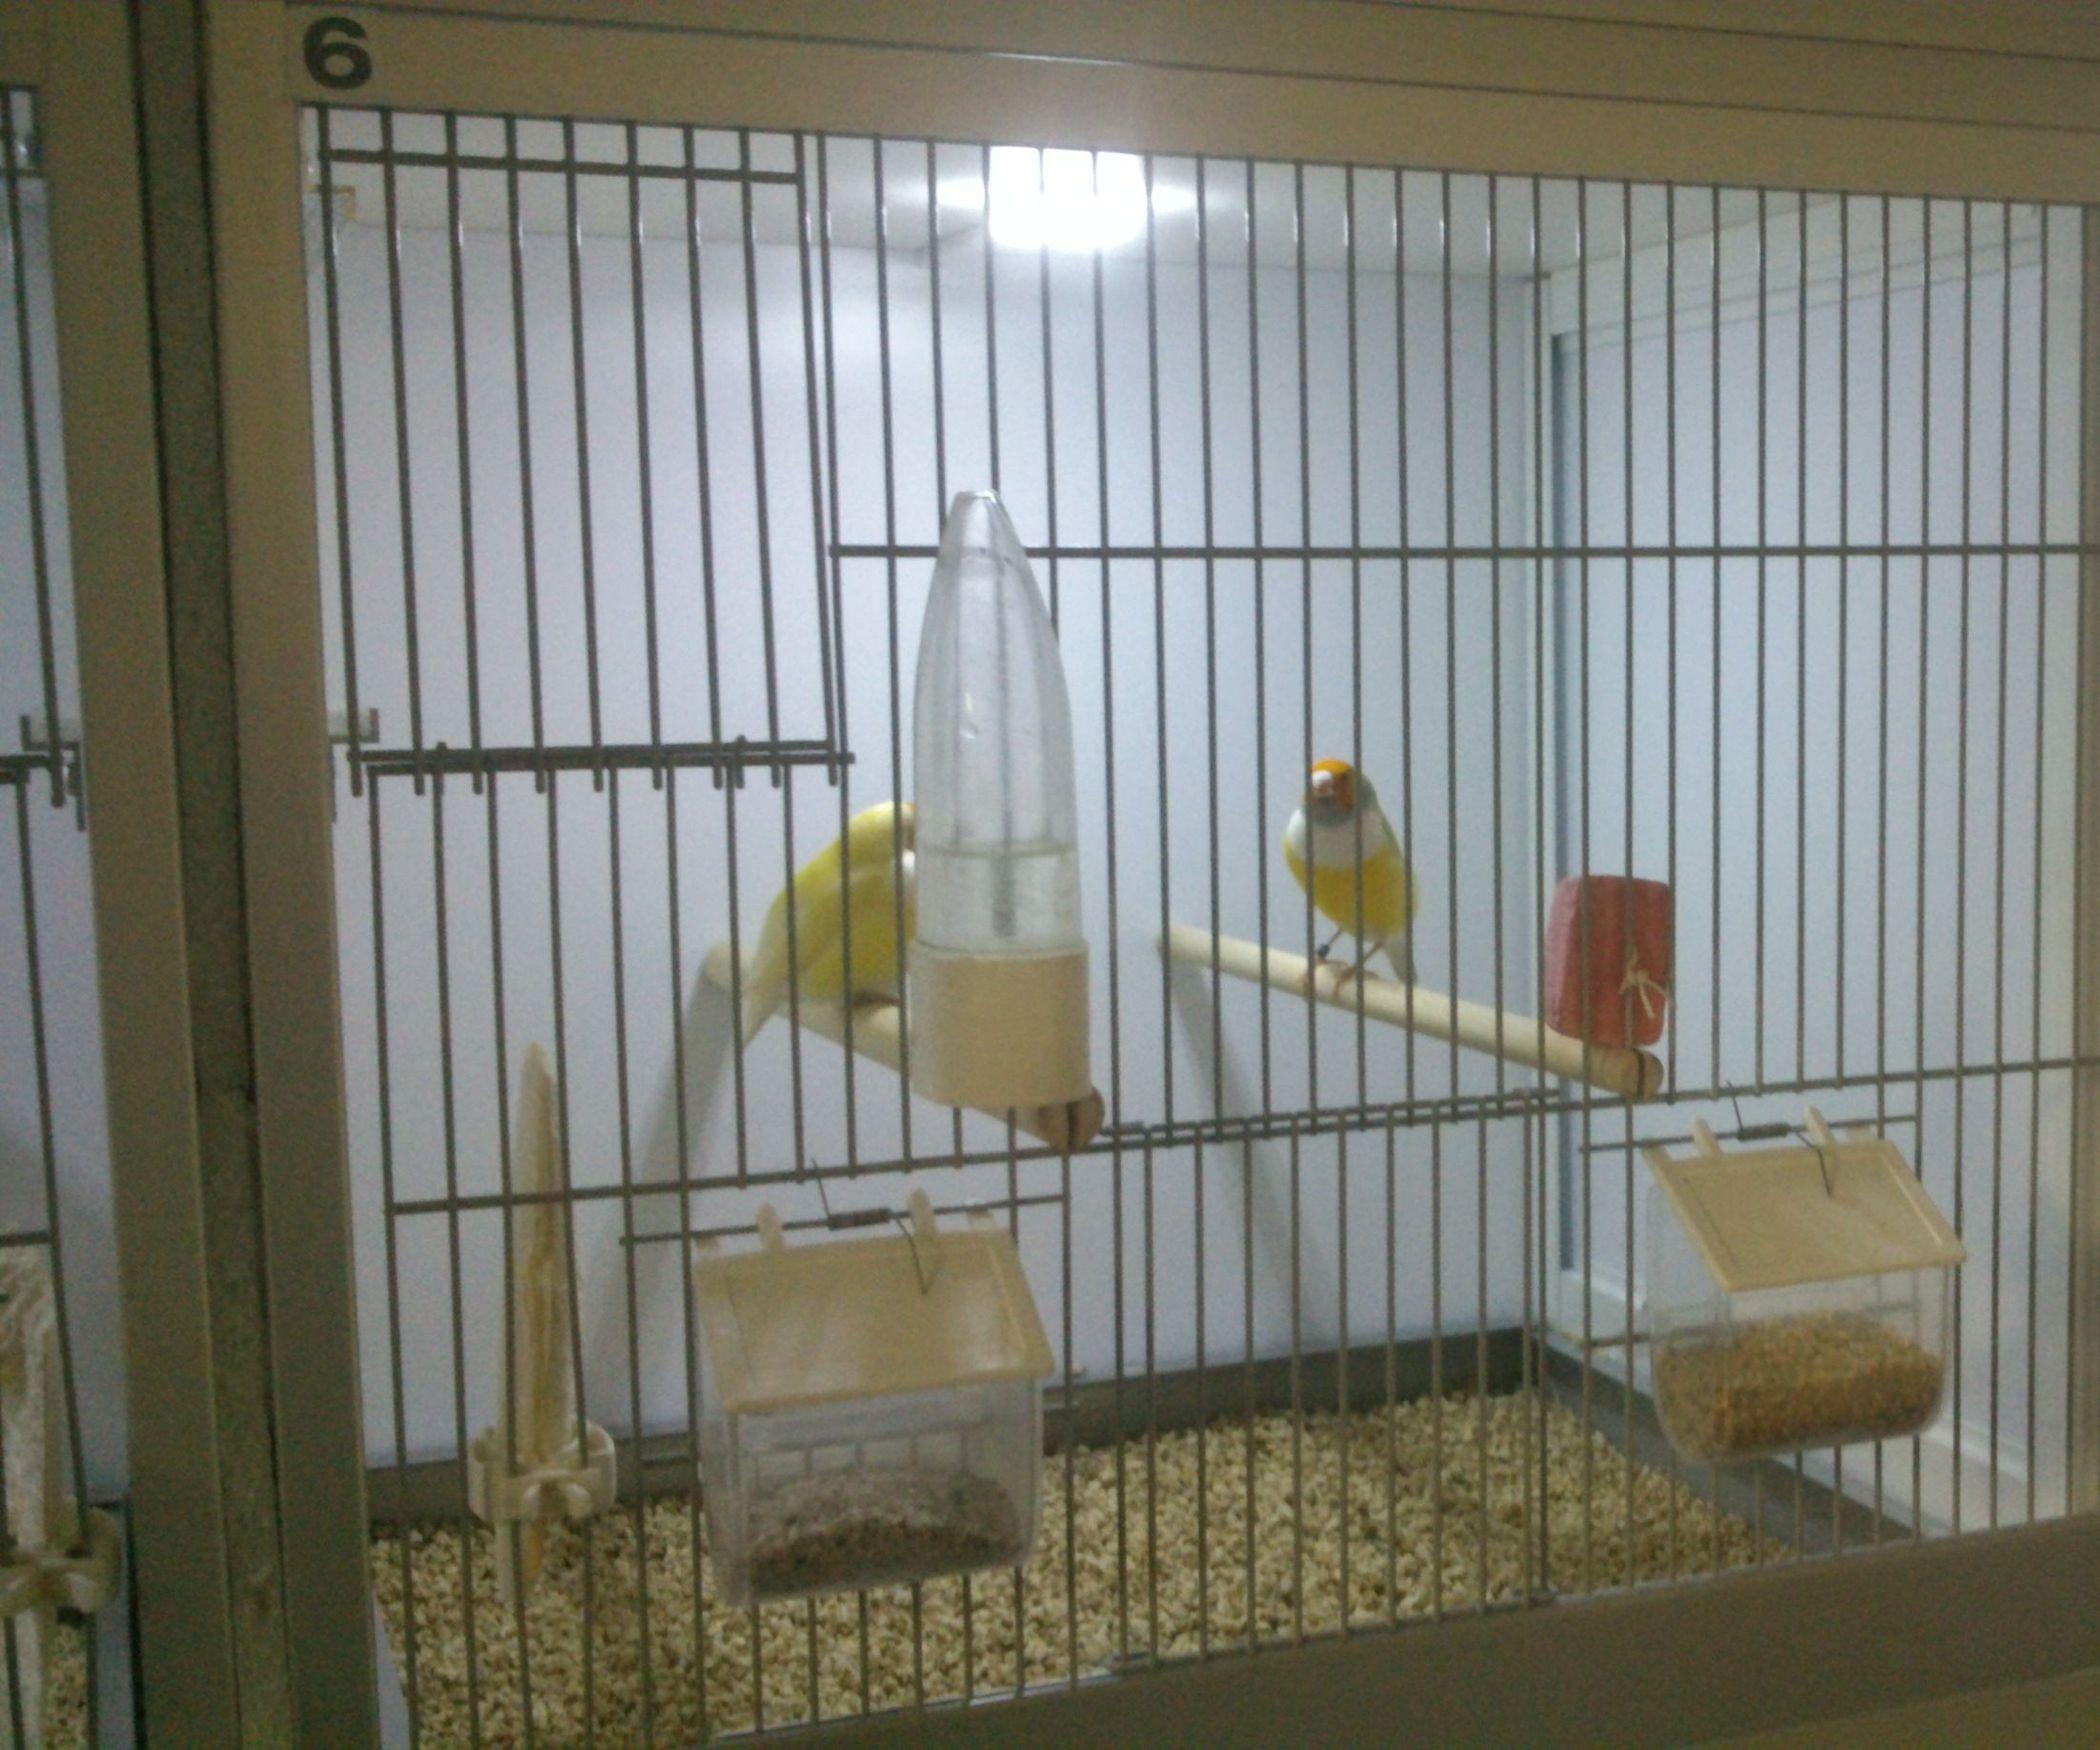 Bird Cage Led Daylight Simulation System Bird House Kits